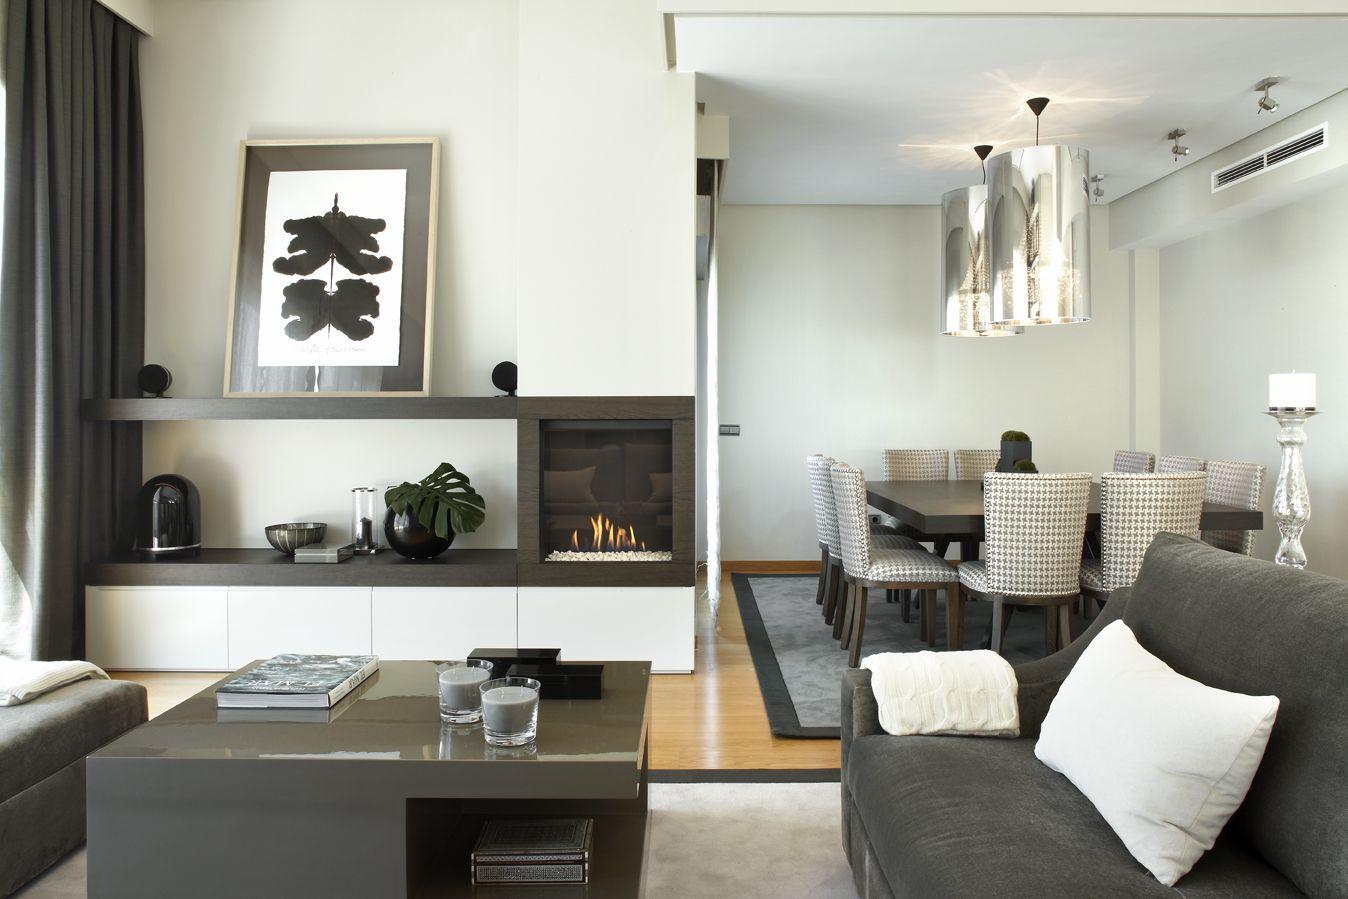 Molins interiors arquitectura interior interiorismo - Decoracion mesa de comedor ...